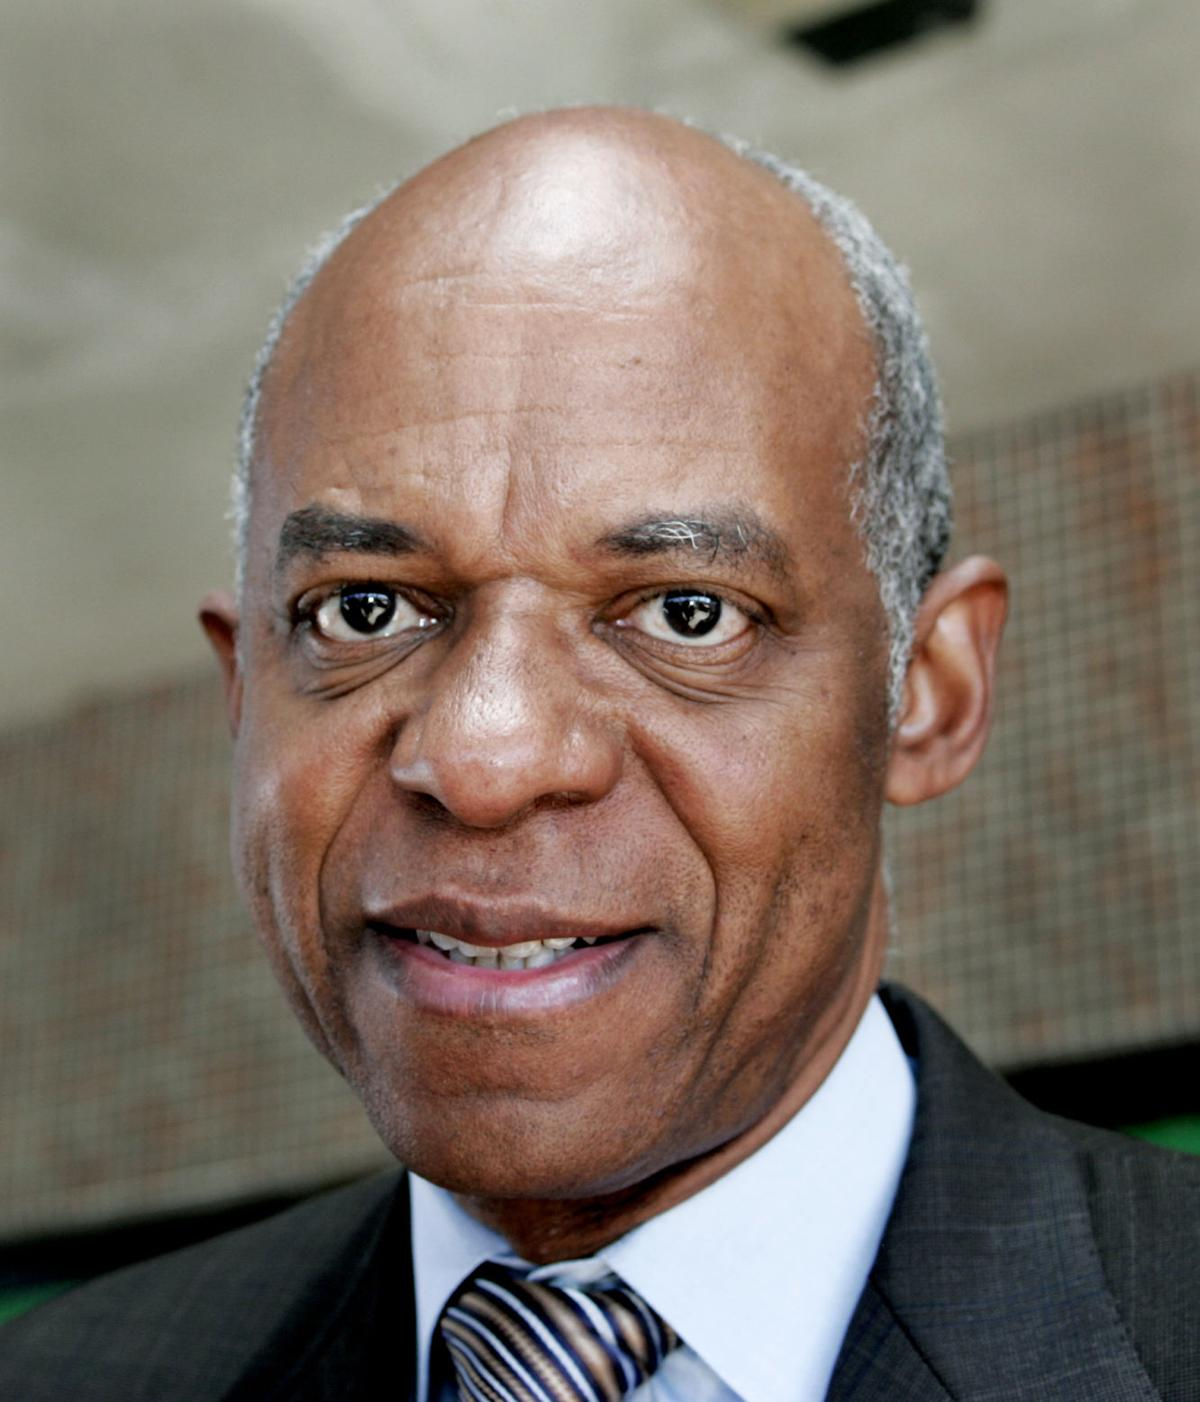 William Jefferson